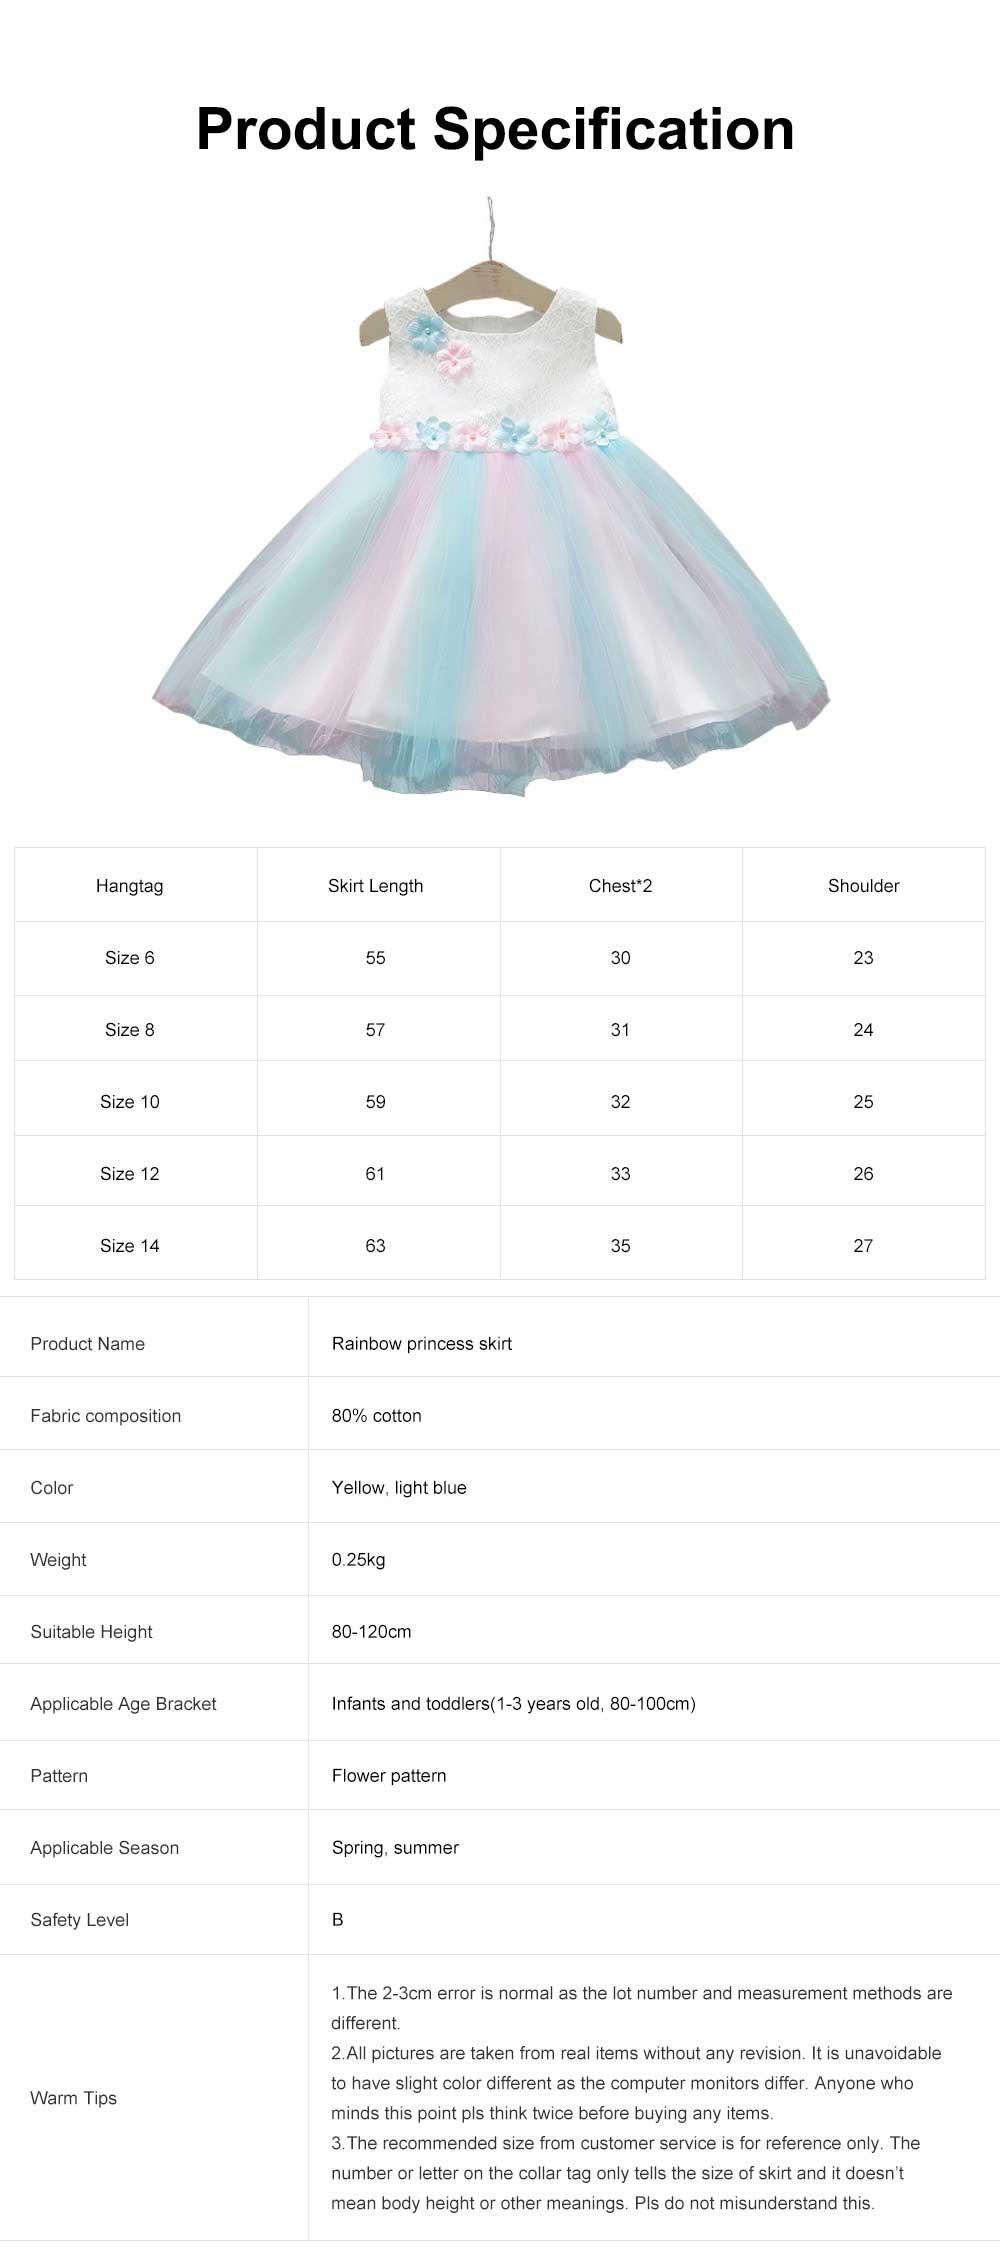 Rainbow Color Princess Skirt for Girl Kids, Summer Wear Korean Style Sleeveless One-piece Dress Princess Skirt for 1-3 Years 6